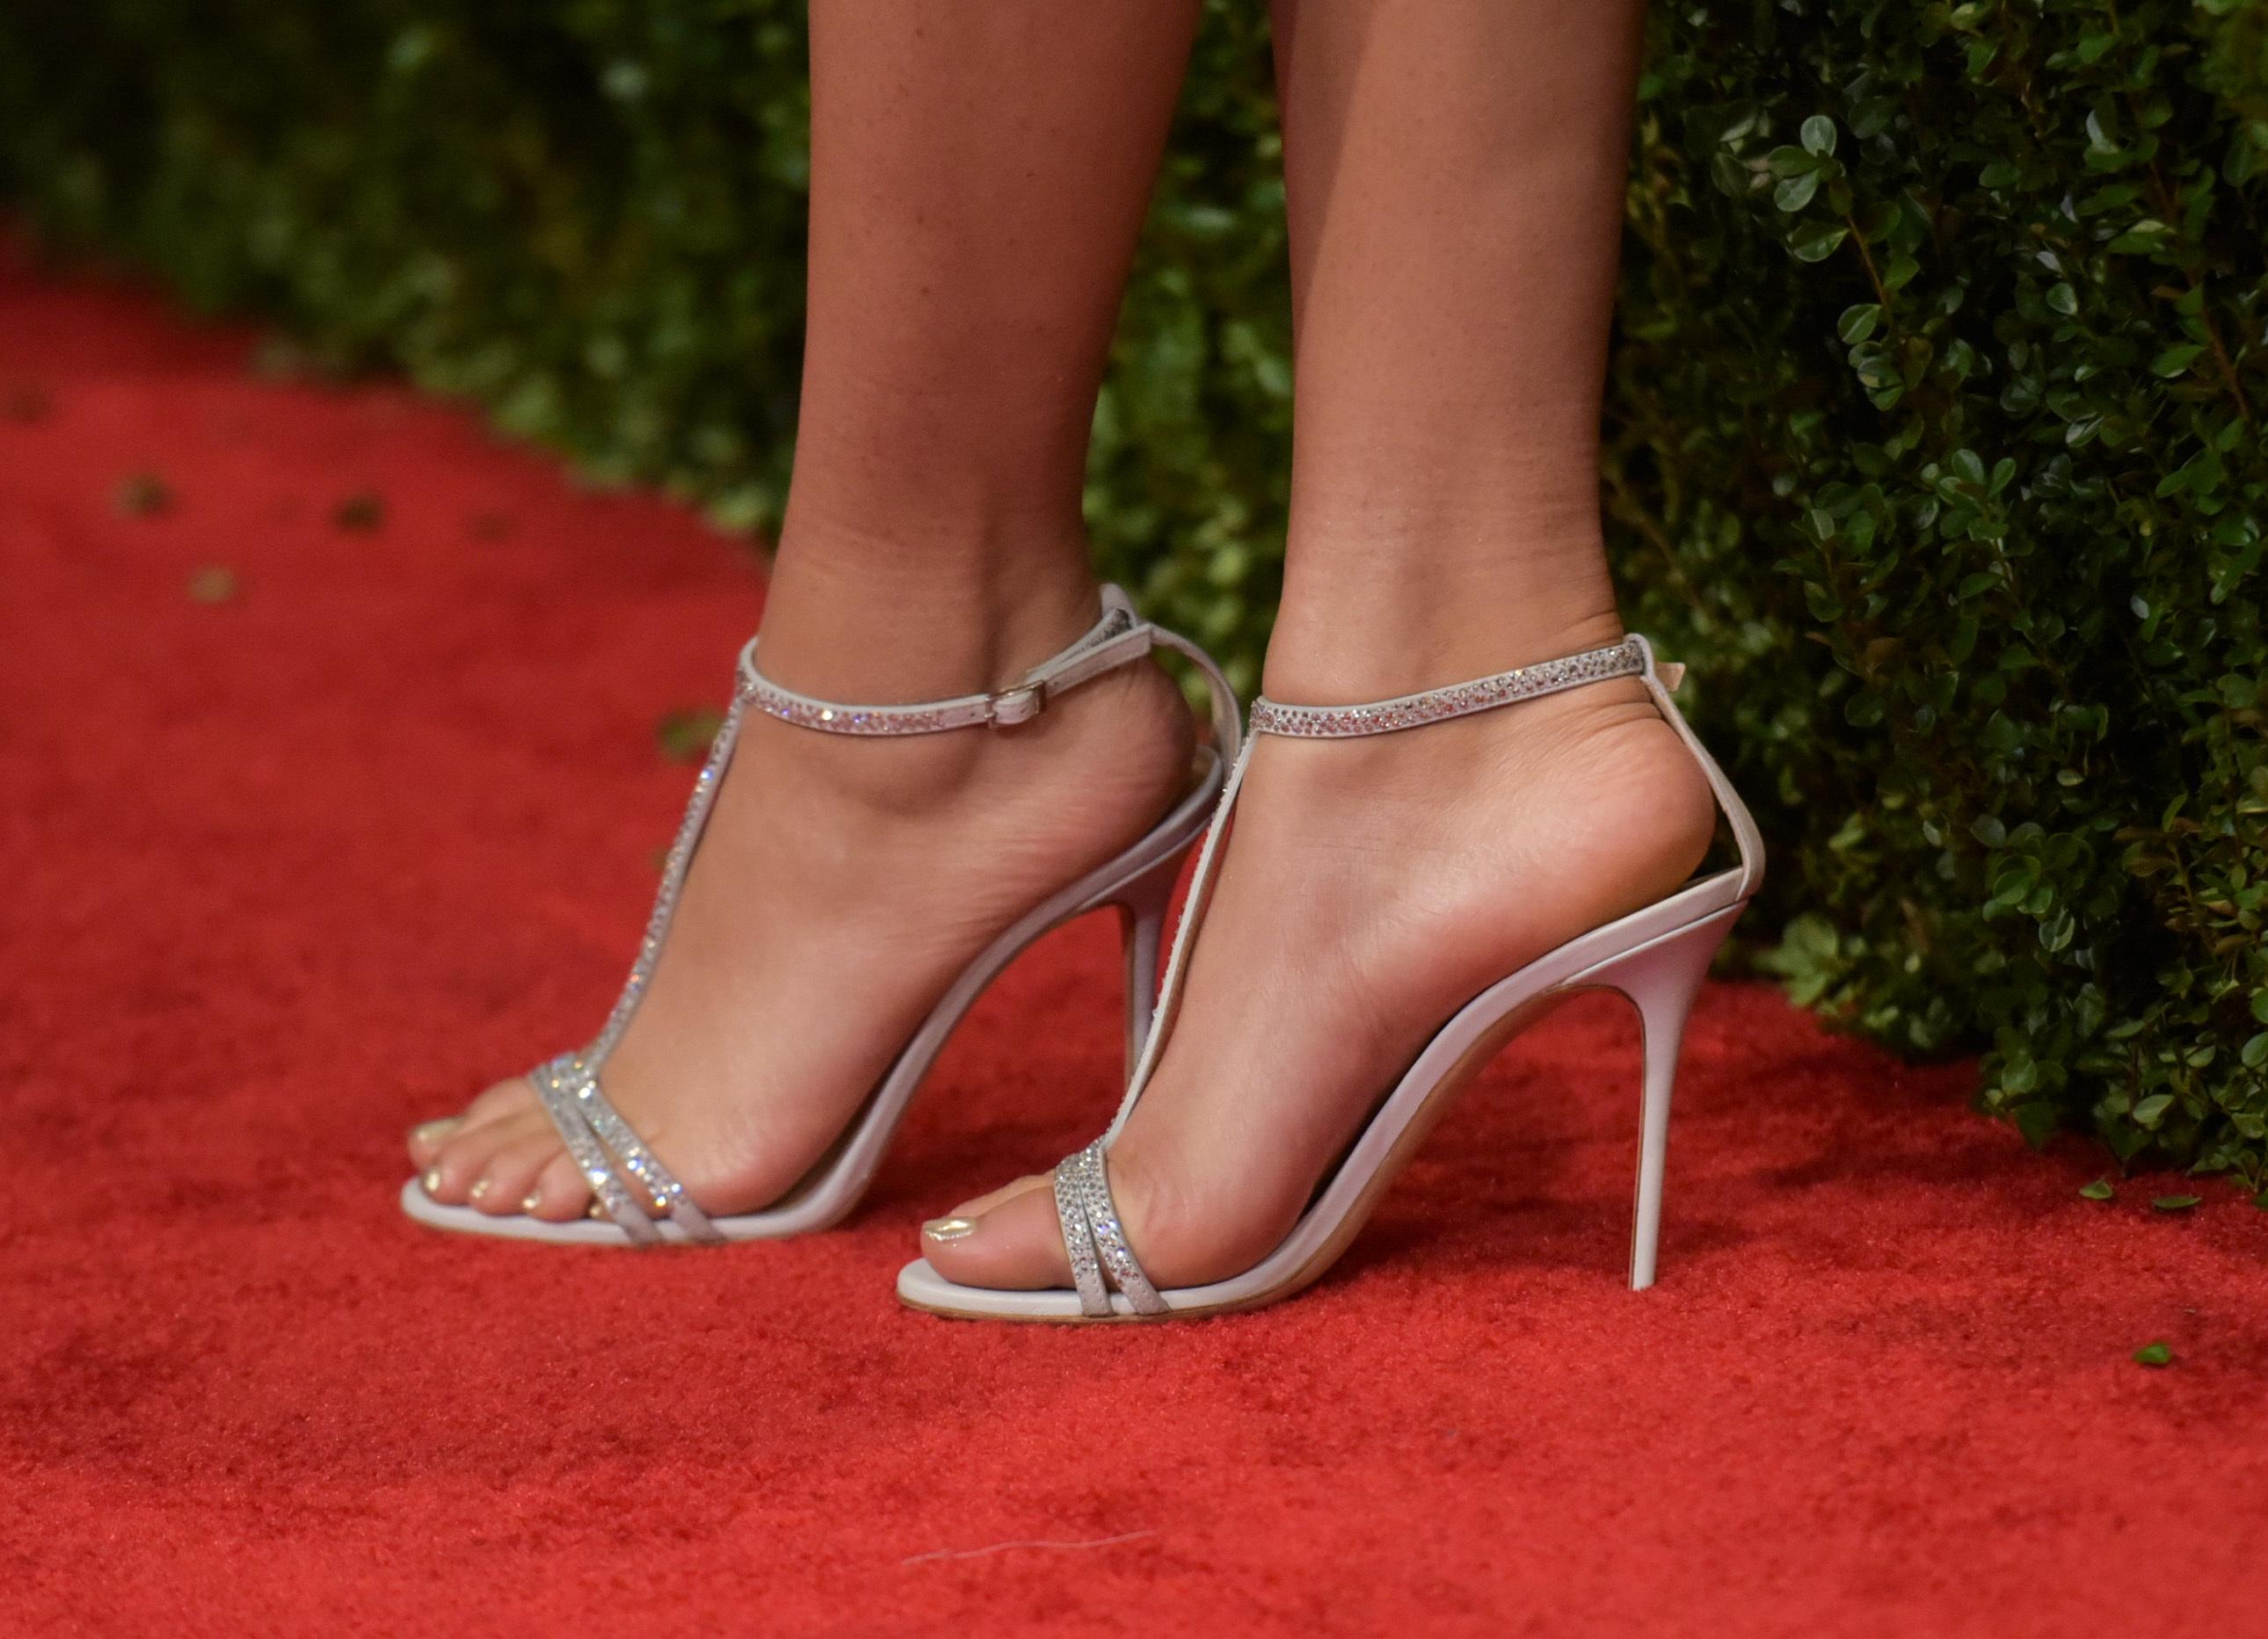 Zendaya's Feet Zendaya Feet